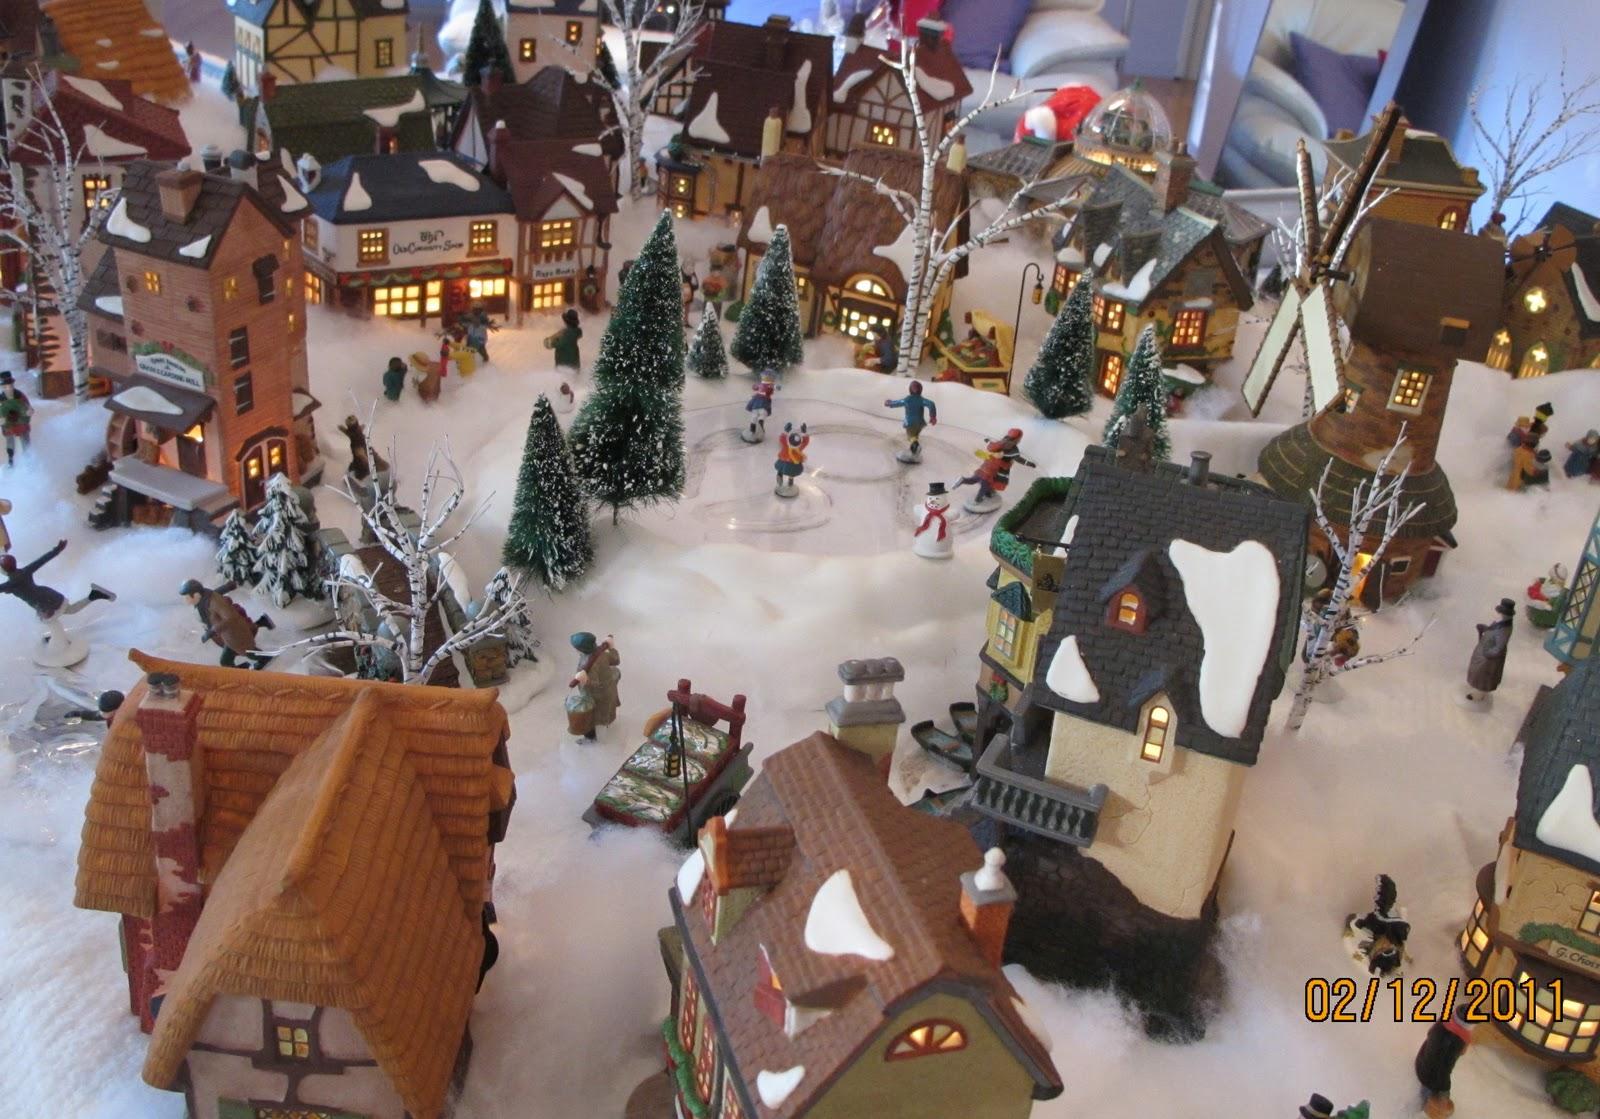 Department 56 dickens village display ideas - Christmas Village Fun Blog